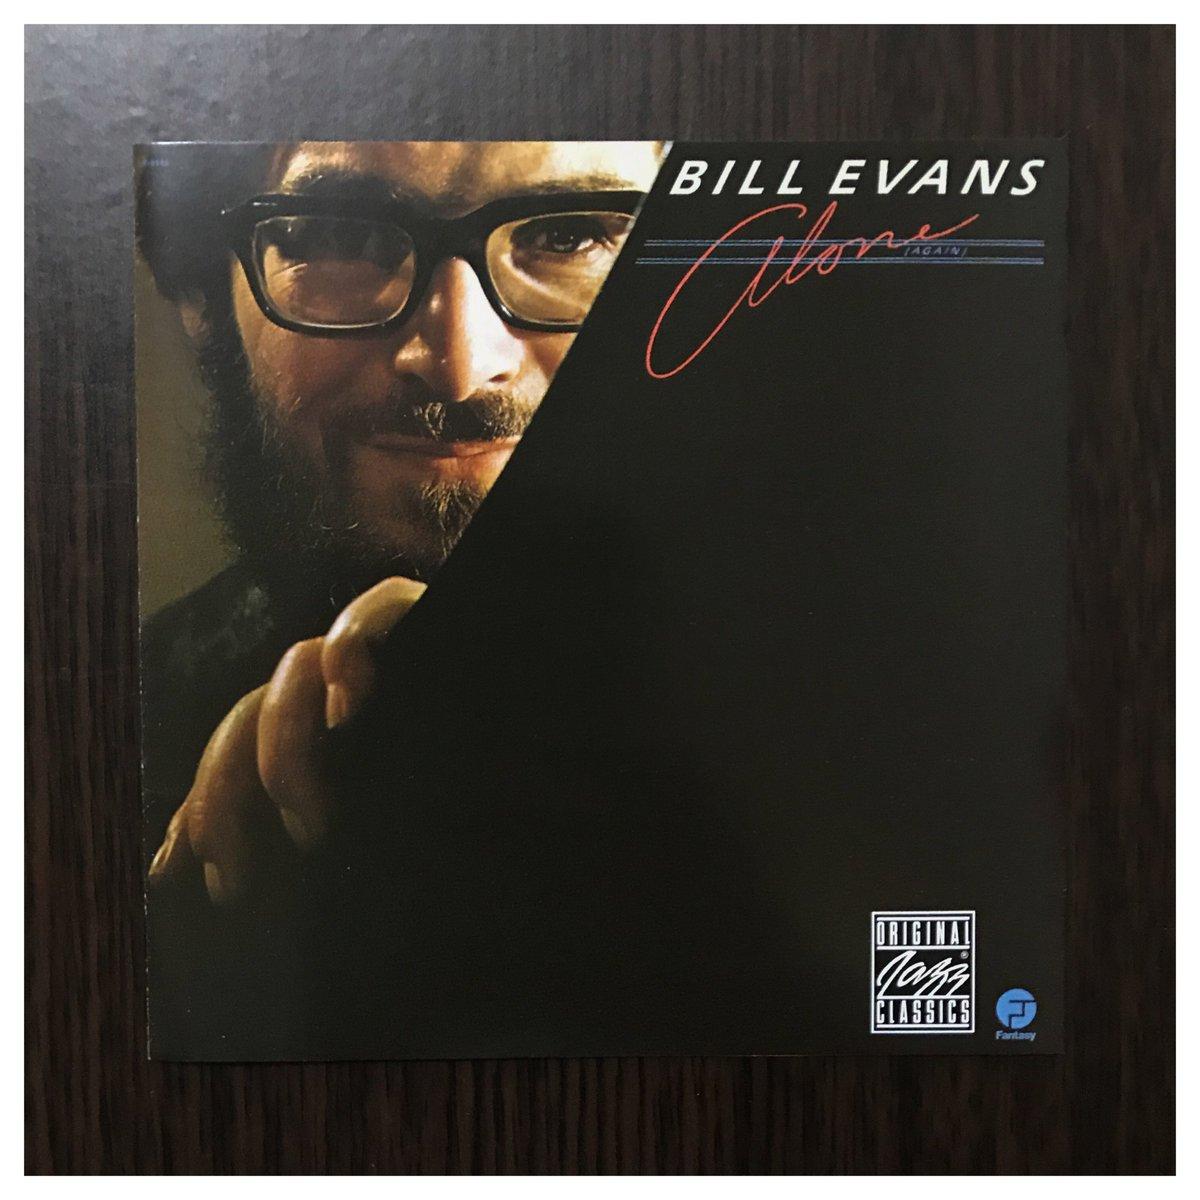 Alone Again | Bill Evans #AloneAgain #BillEvans #ジャズ #Jazz #音楽 #music #Musik #Музыка #art #Kunst #CD<br>http://pic.twitter.com/PUXyPG8NrF